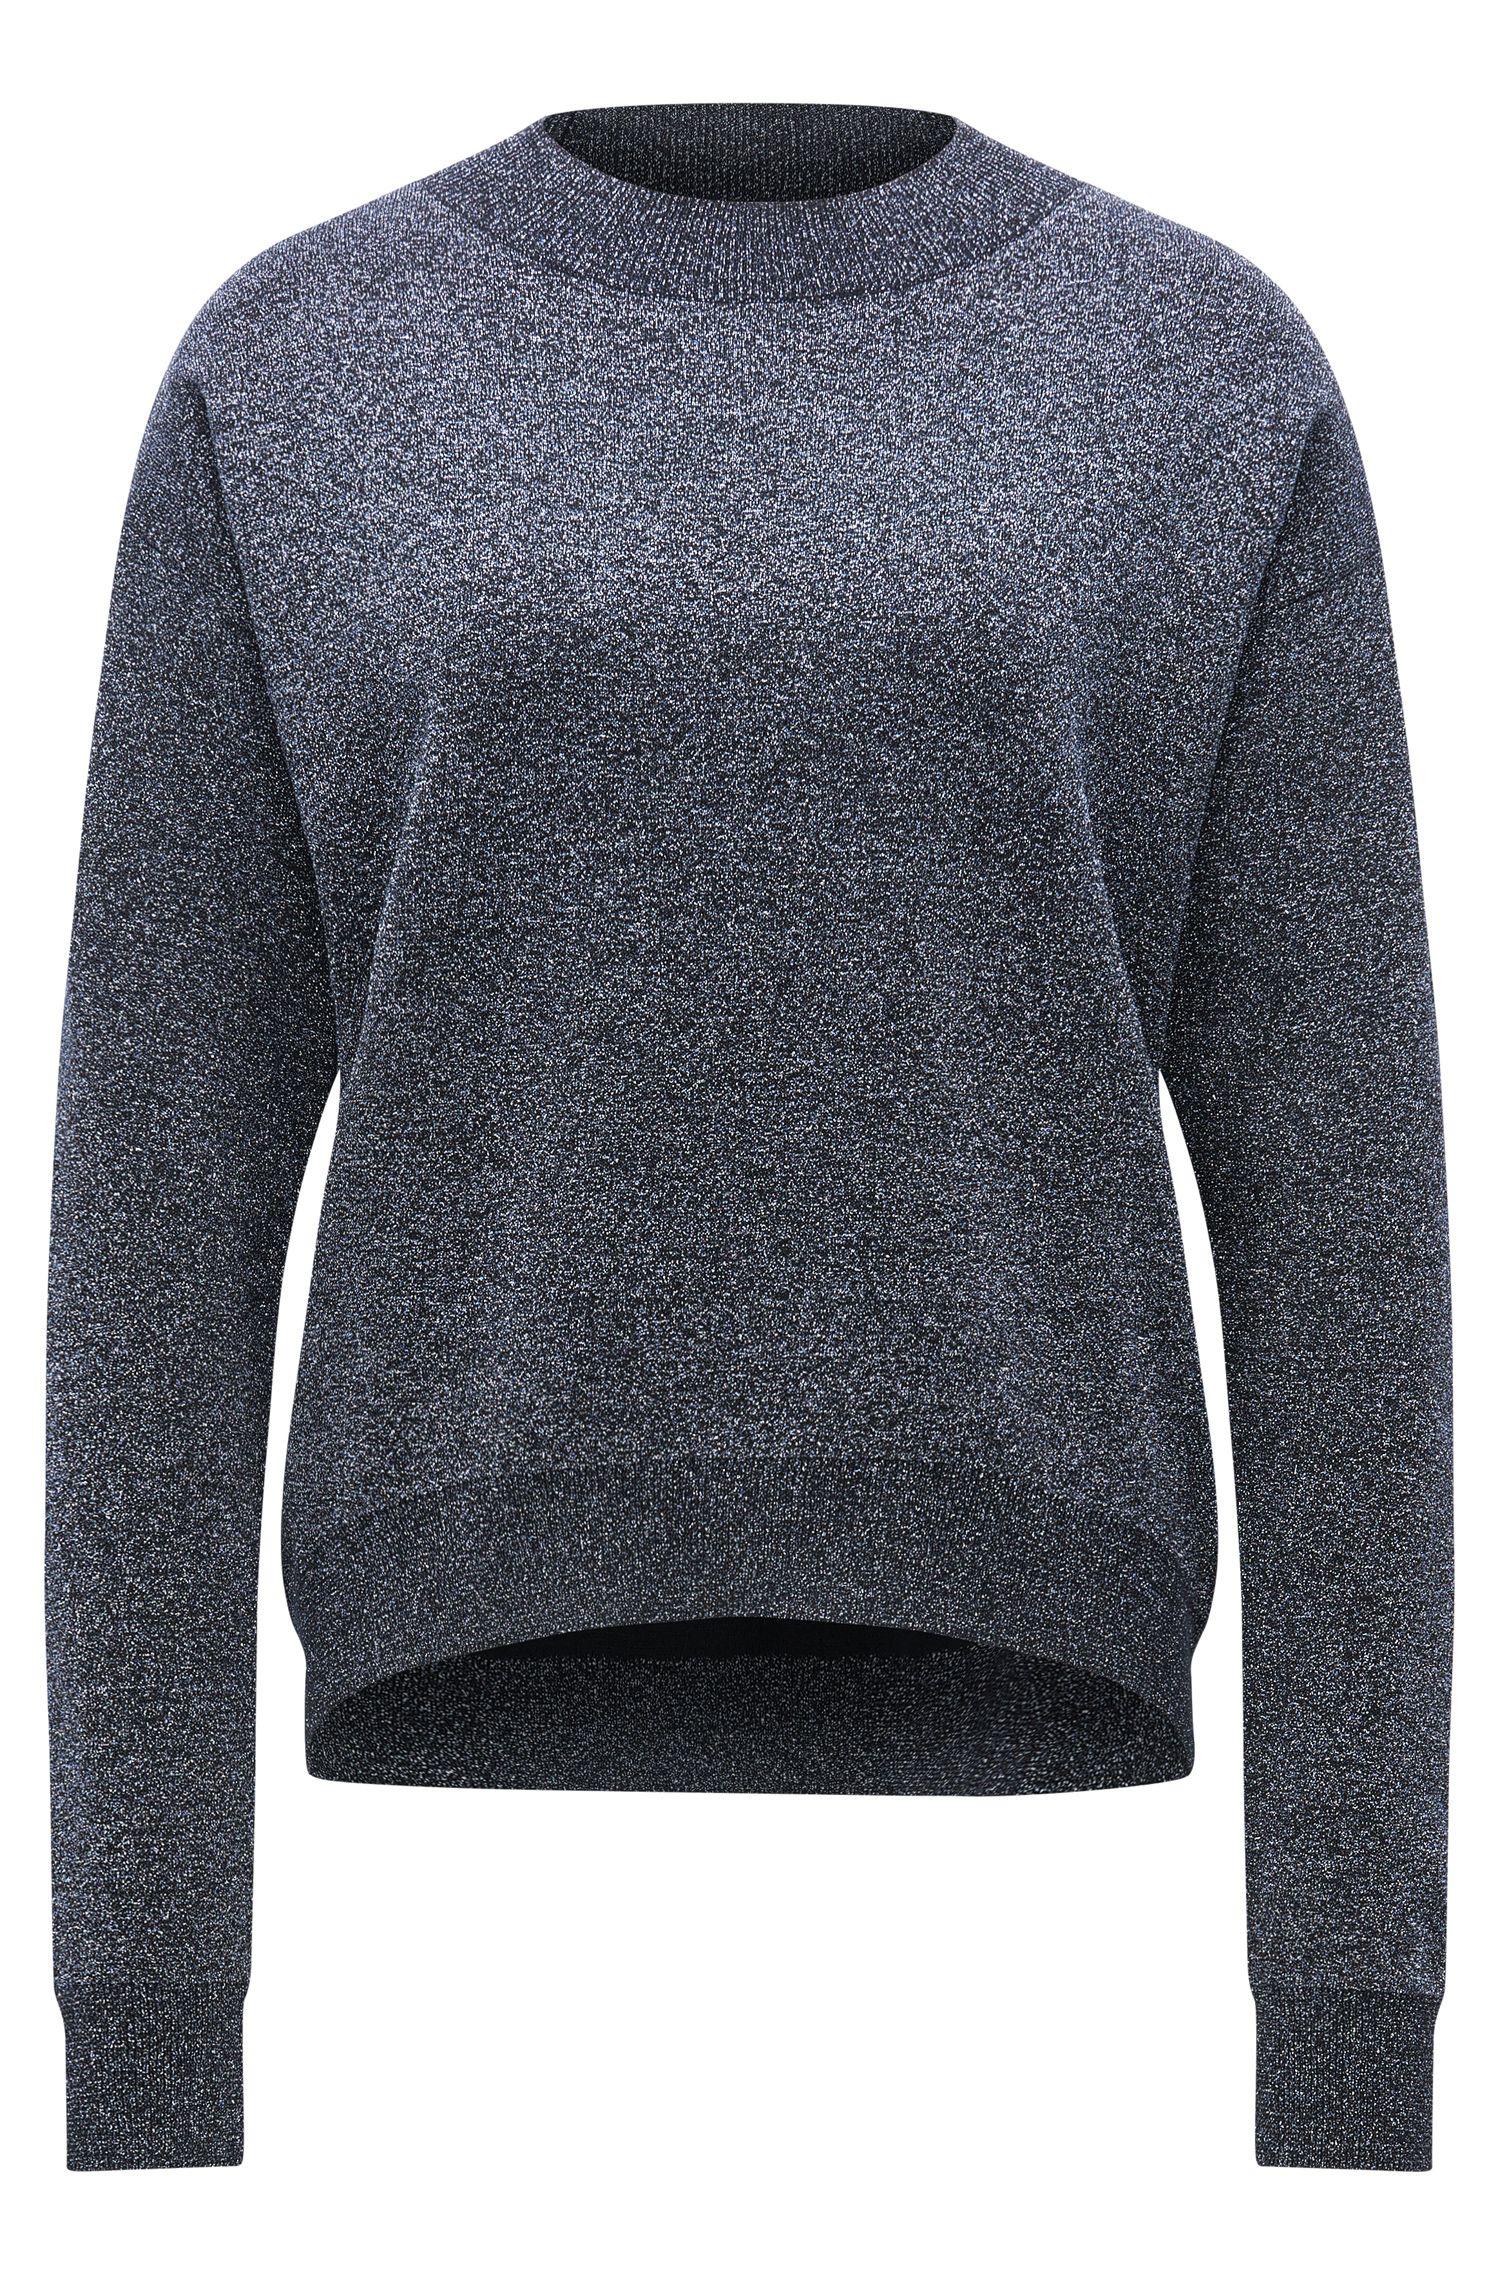 Crew-neck sweater in a metallic virgin wool blend